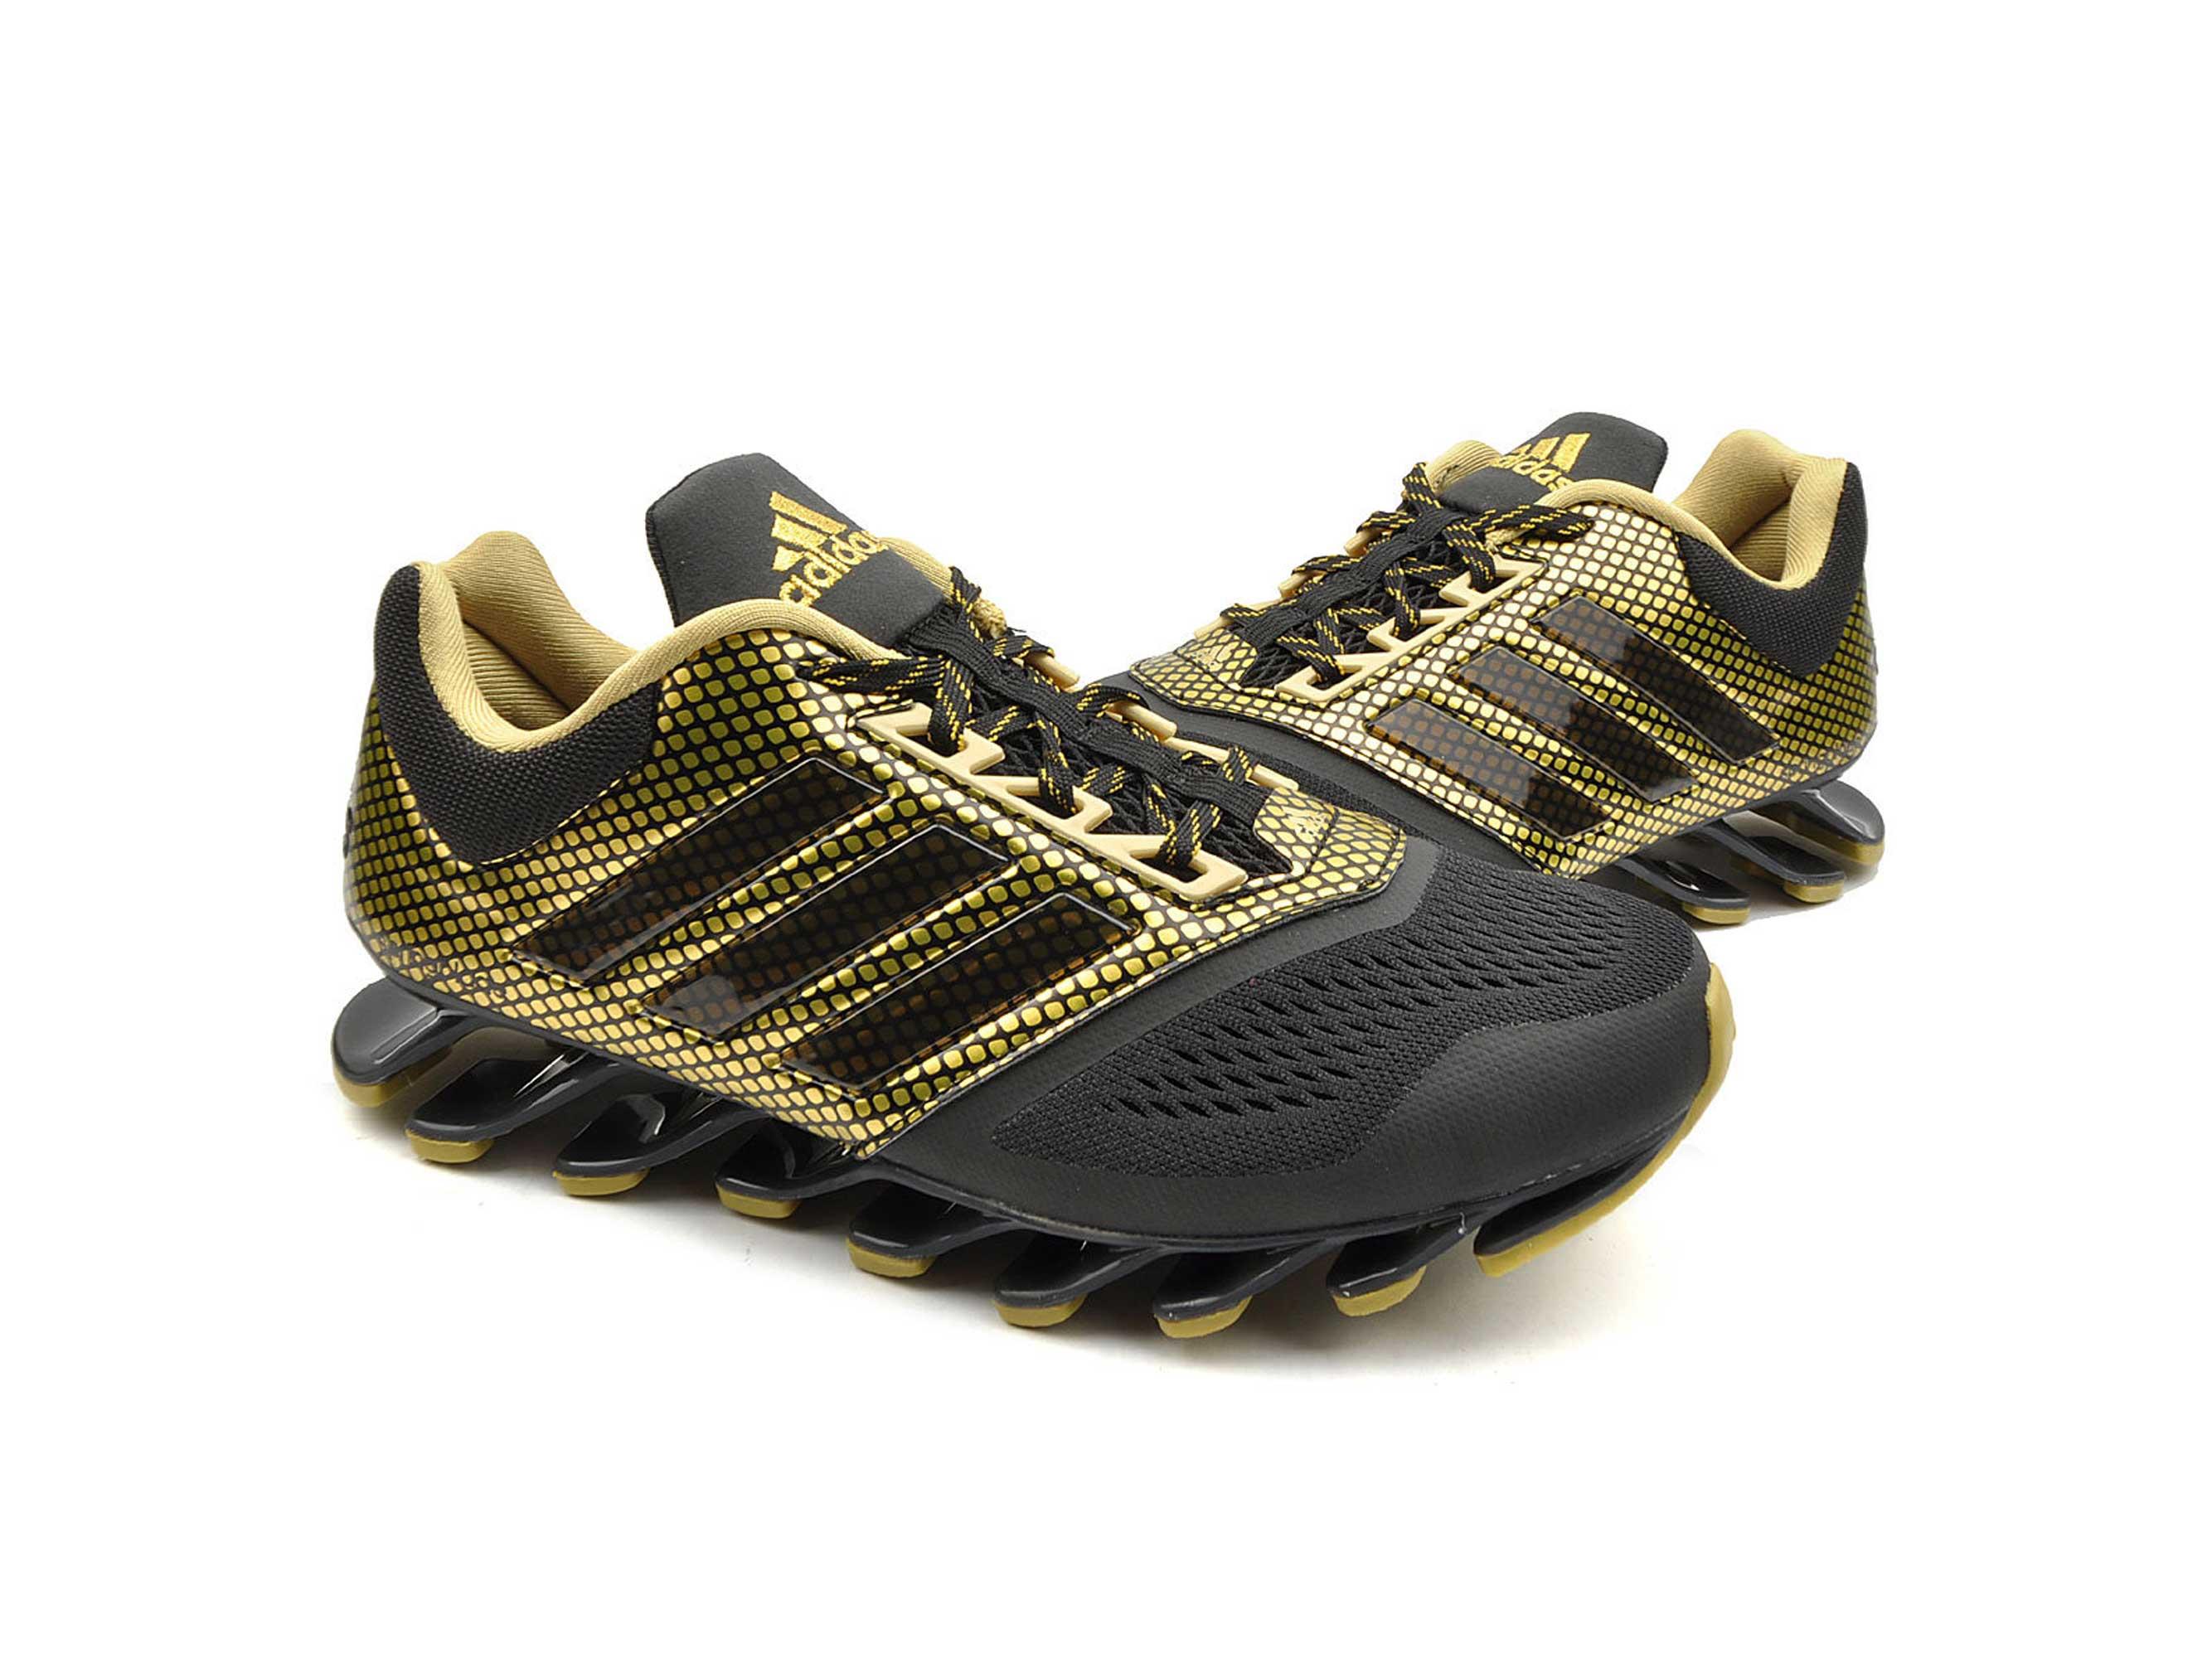 Drive 0 2 Adidas Springblade Gold Navy Black xCQrBWdoe